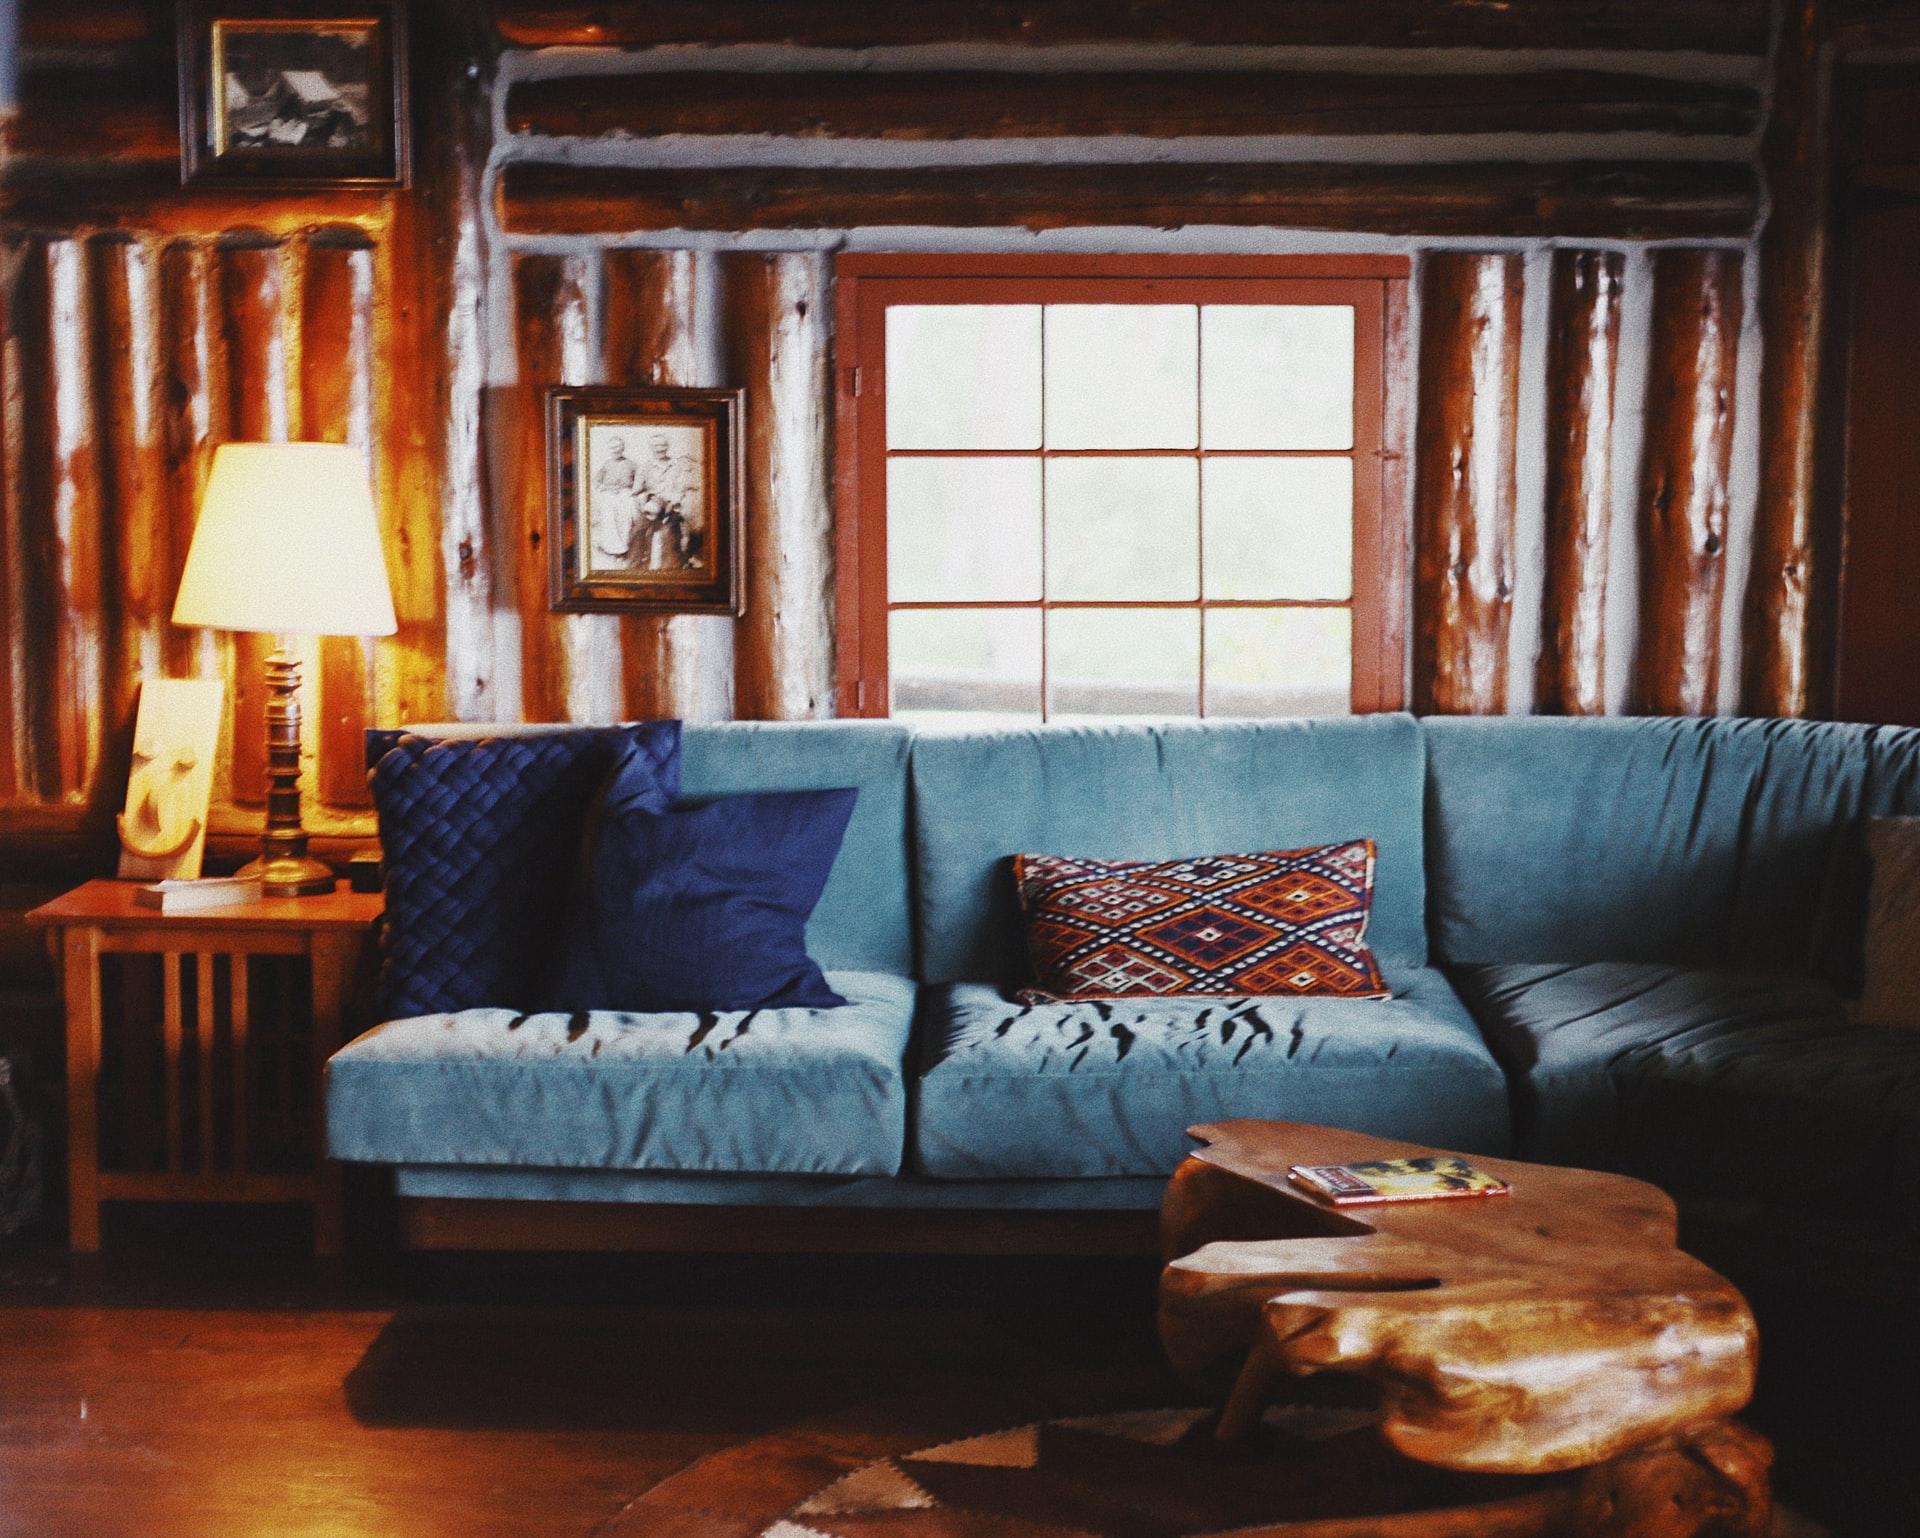 image - furniture